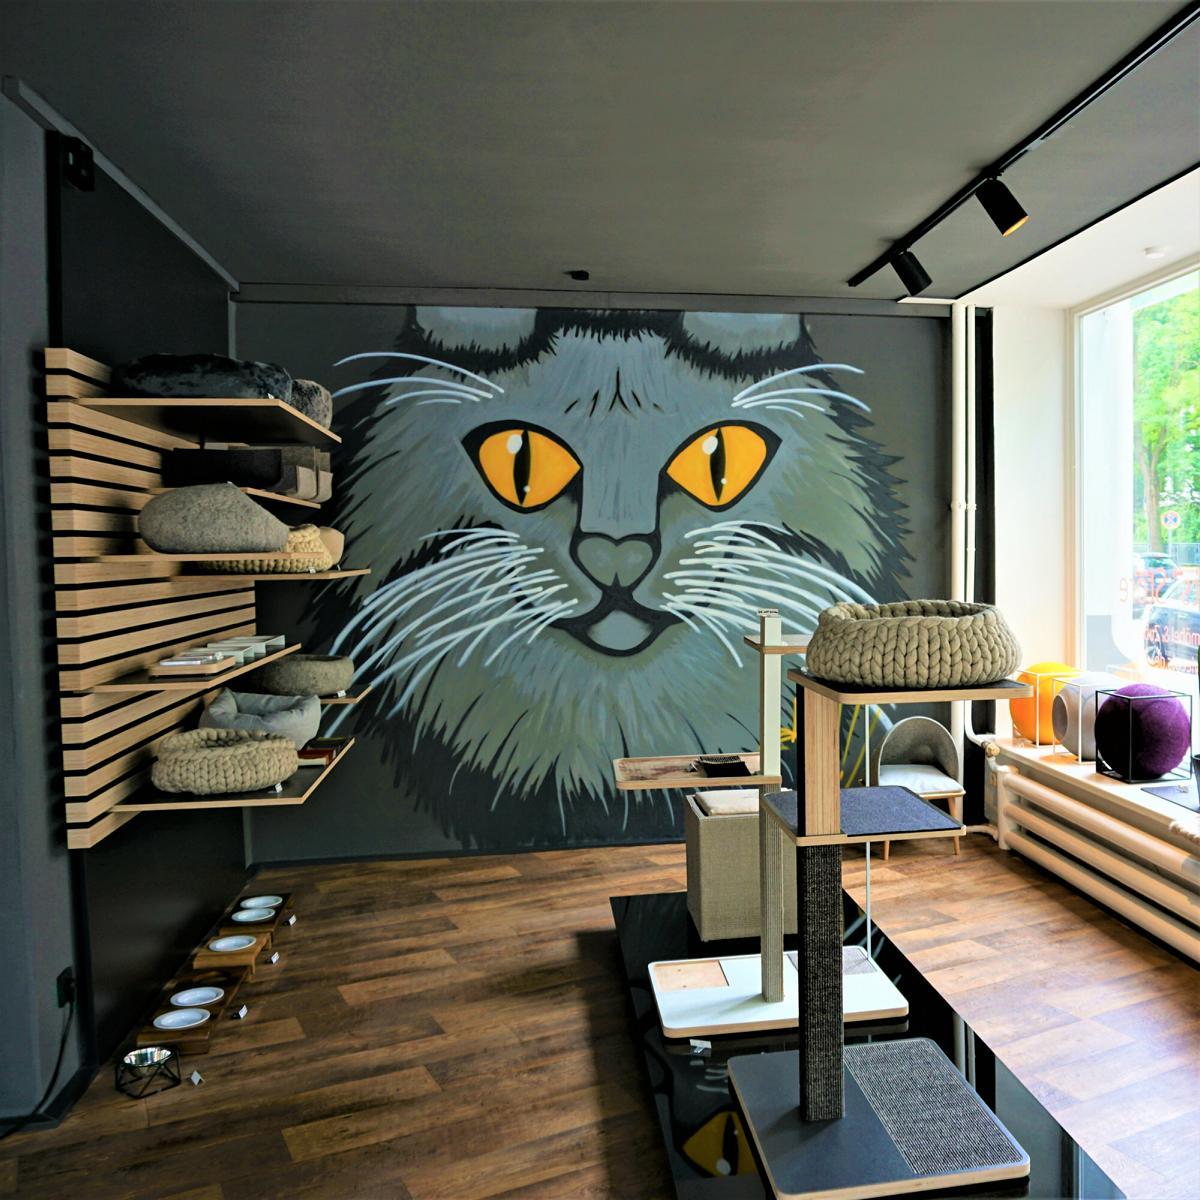 style hannover styleCats B - stylecats® - Katzenmöbel